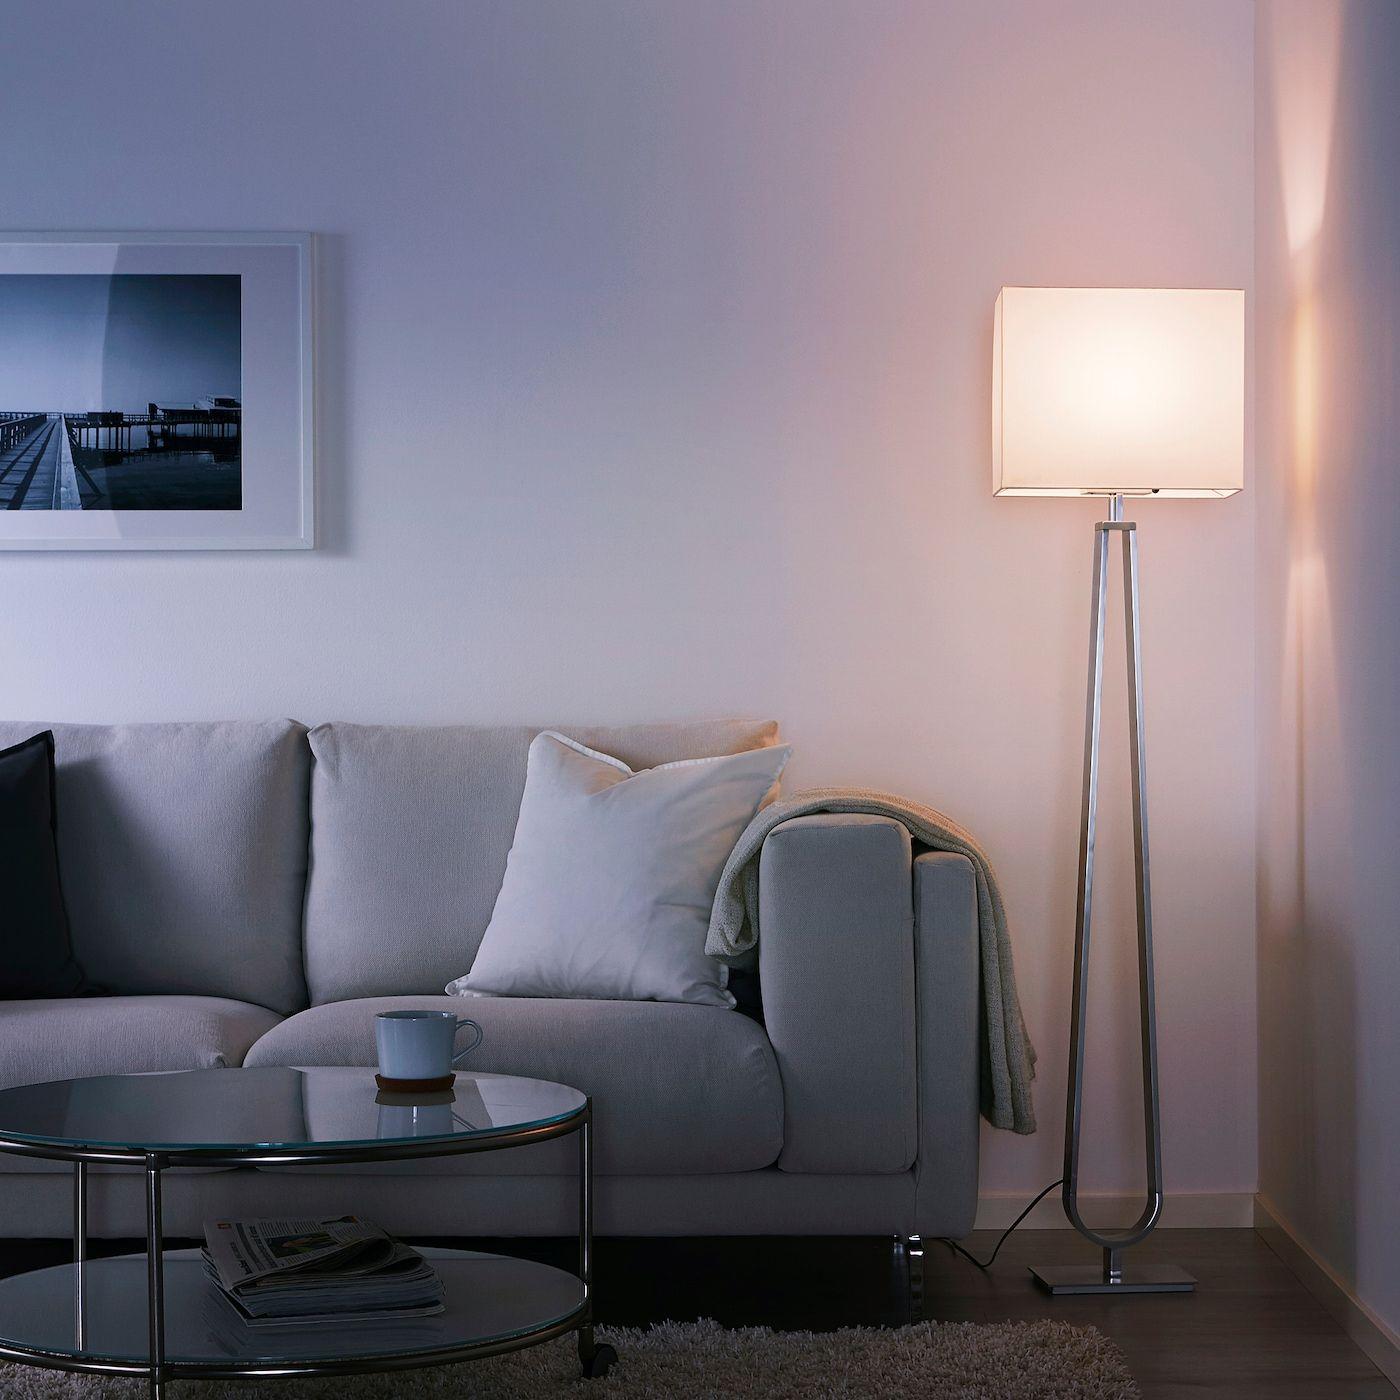 KLABB Floor lamp off white in 2020 | Standleuchte